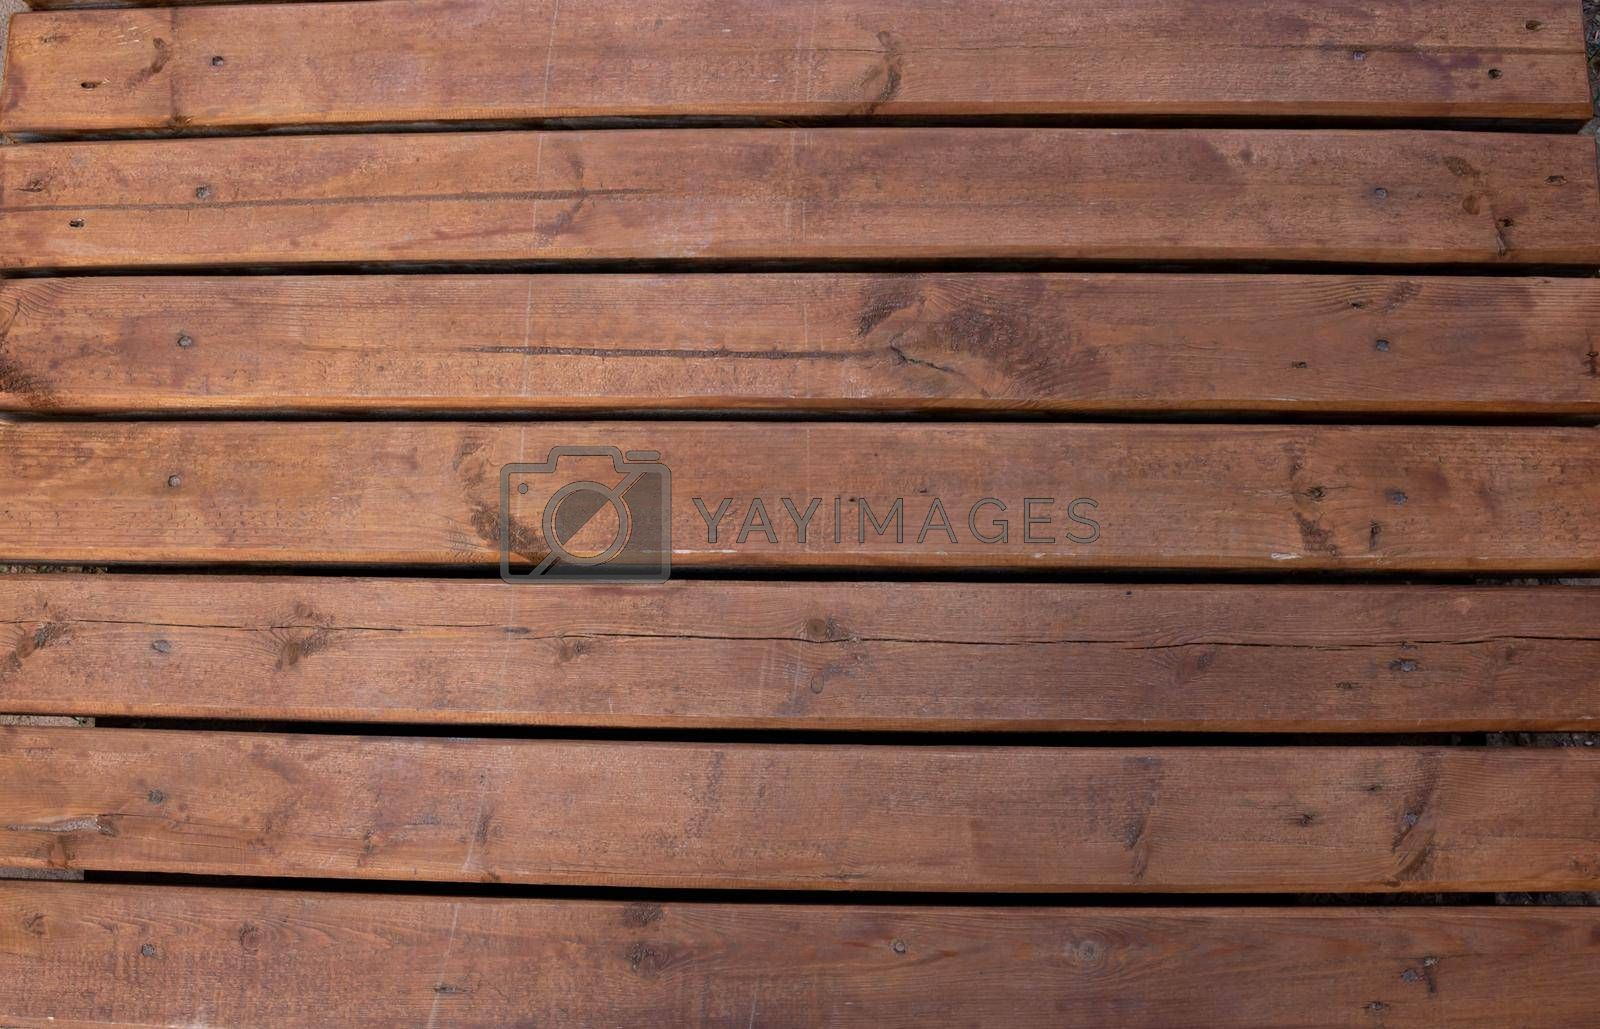 Brown wooden boardwalk.Beautiful rustic background.